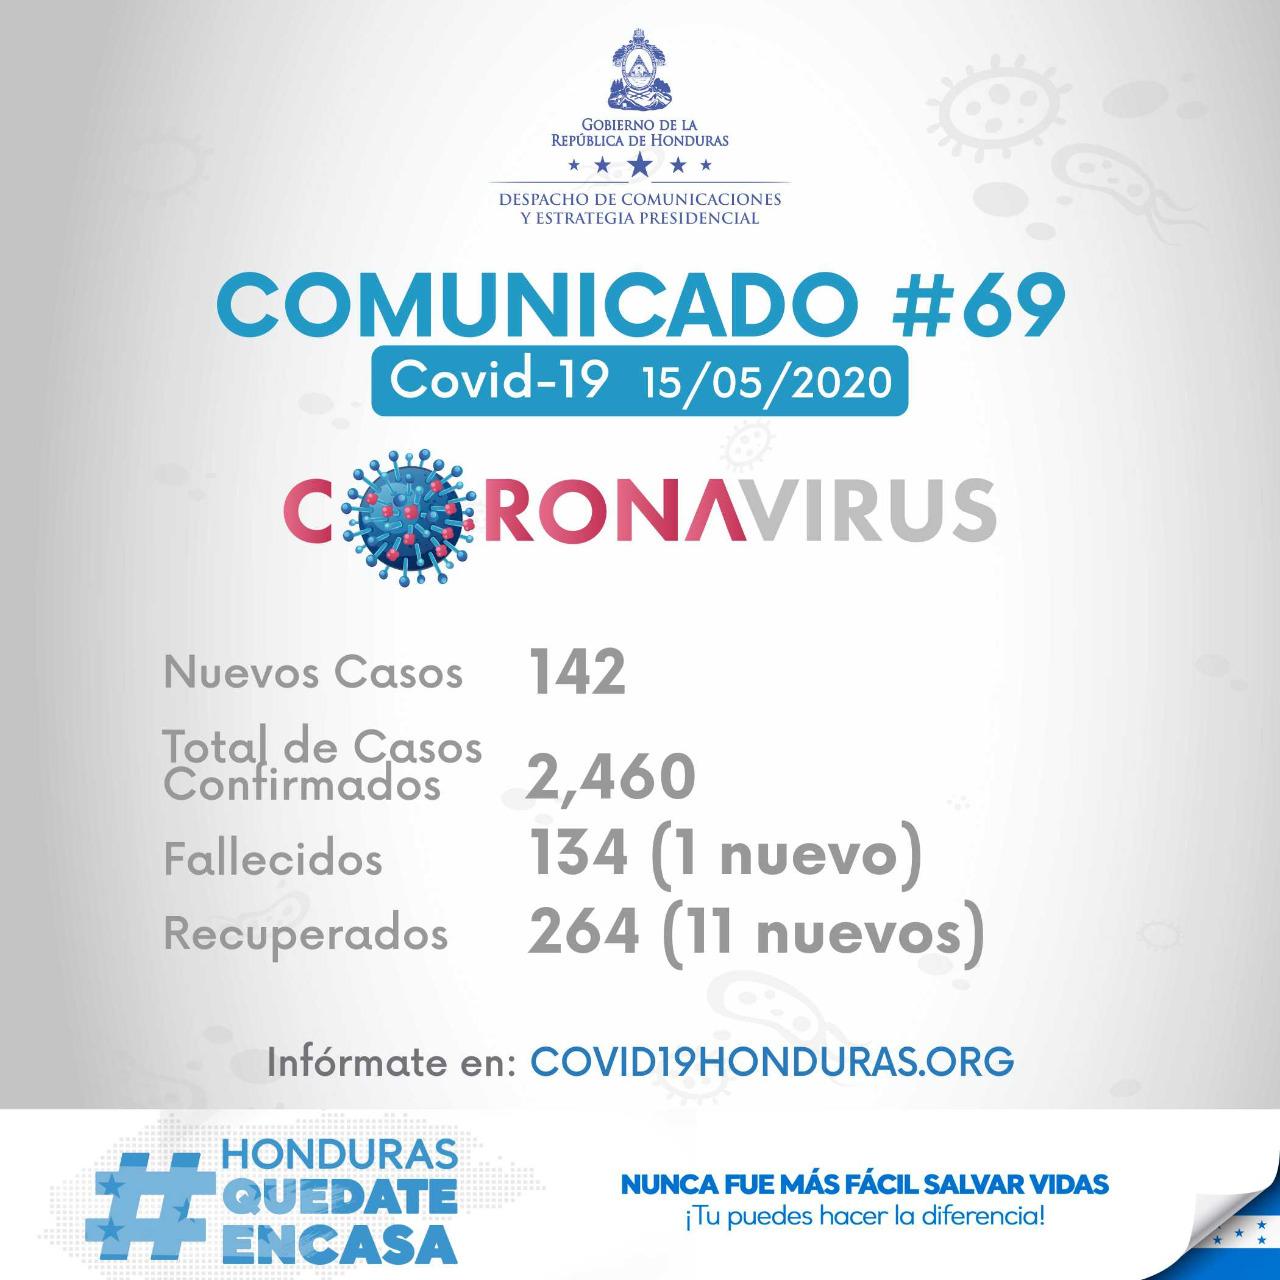 2,460 casos de Covid-10 en Honduras